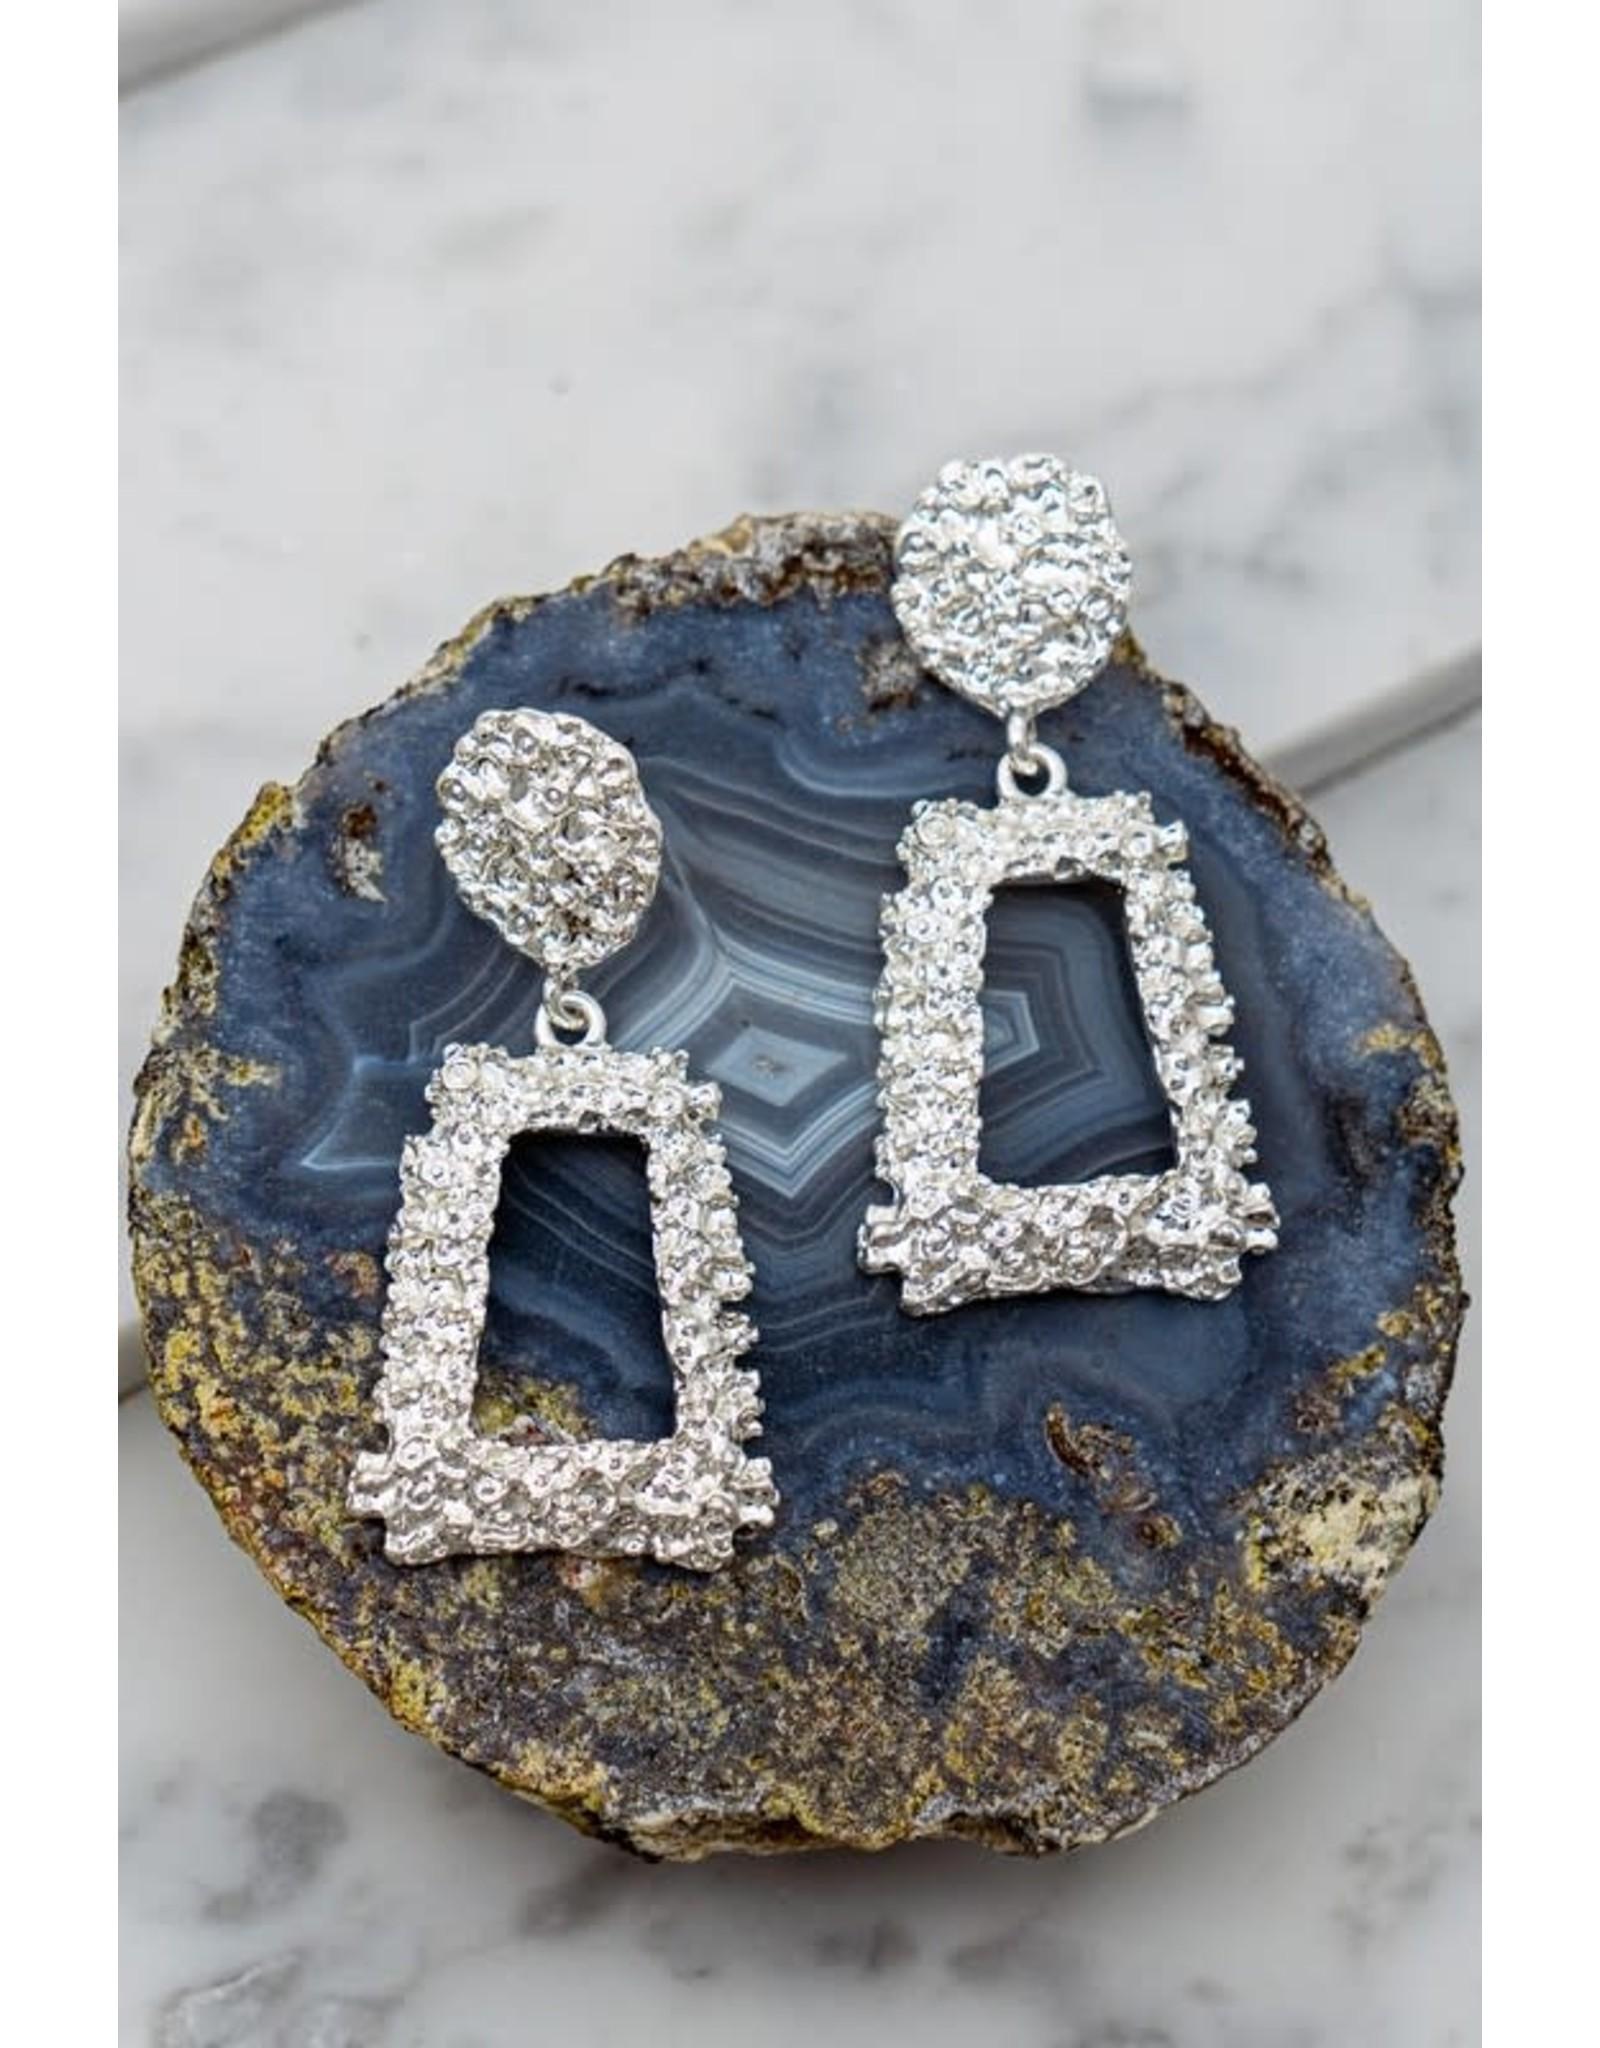 "Size: 1.5"" X 2.5"" Geo Shape Gold Nugget Casting Dangling Earrings"